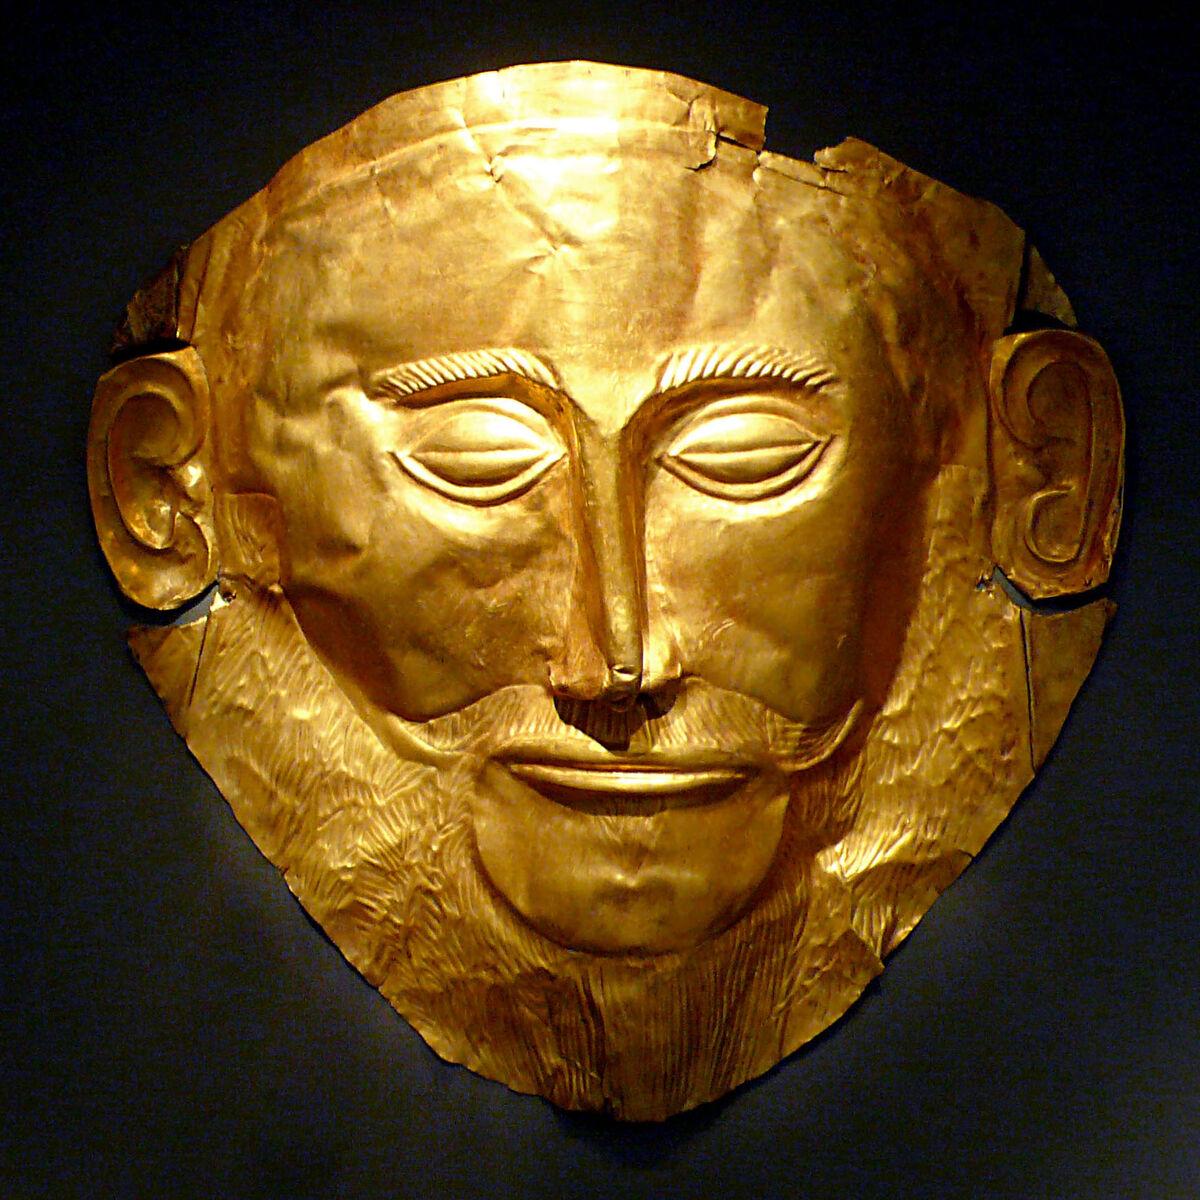 Mask of Agamemnon. Photo via Wikimedia Commons.